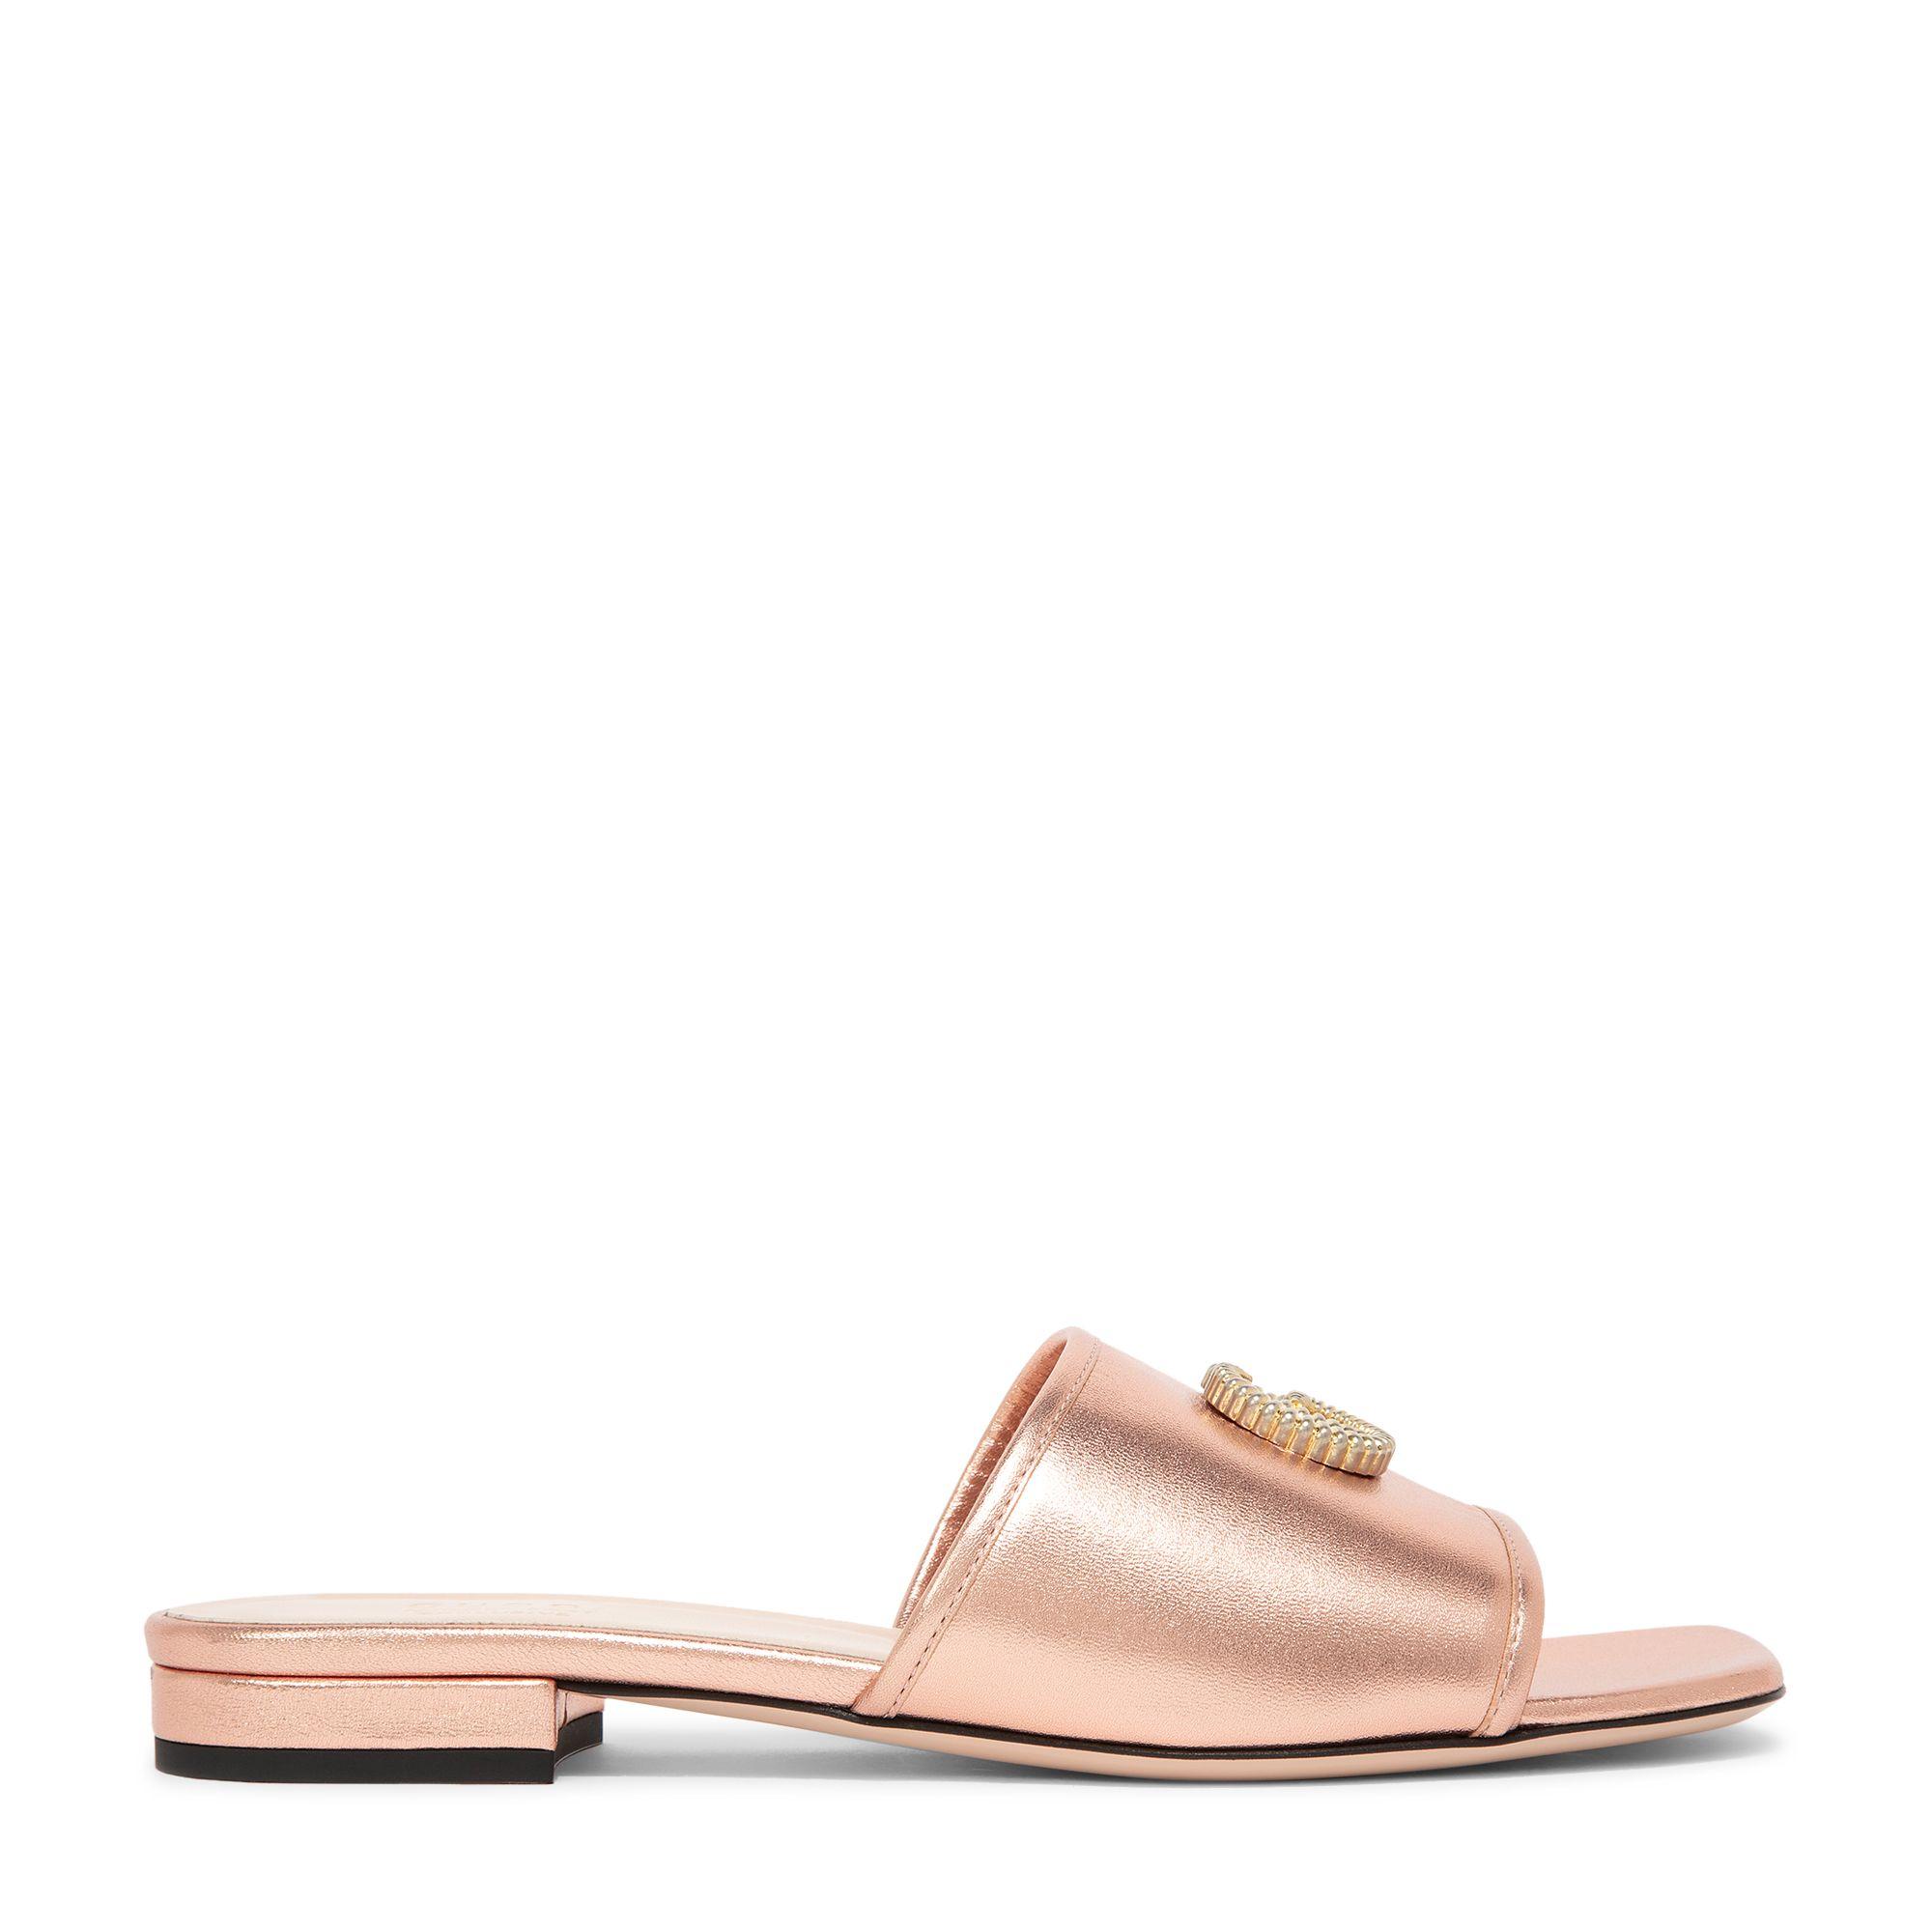 Double G slide sandals